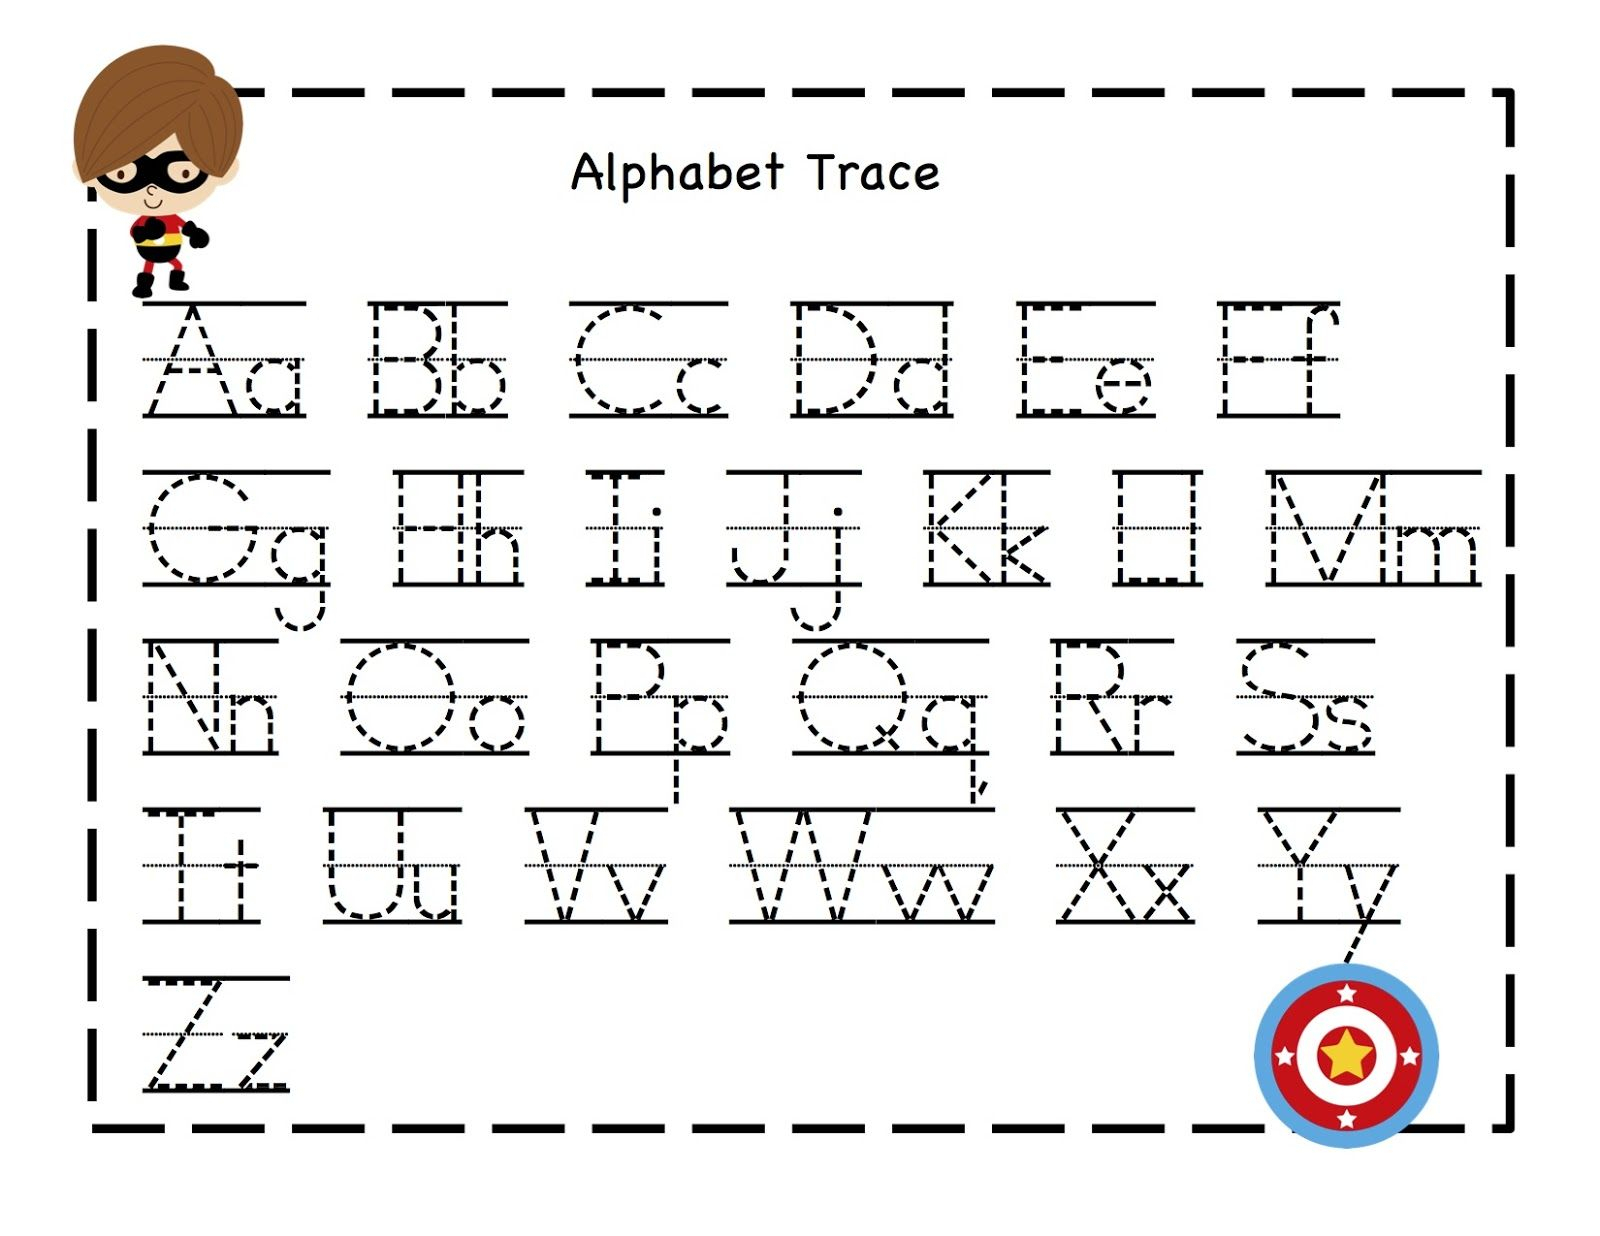 Super Hero Abc Tracing Sheets 1 | Alphabet Tracing regarding Alphabet Tracing Printables